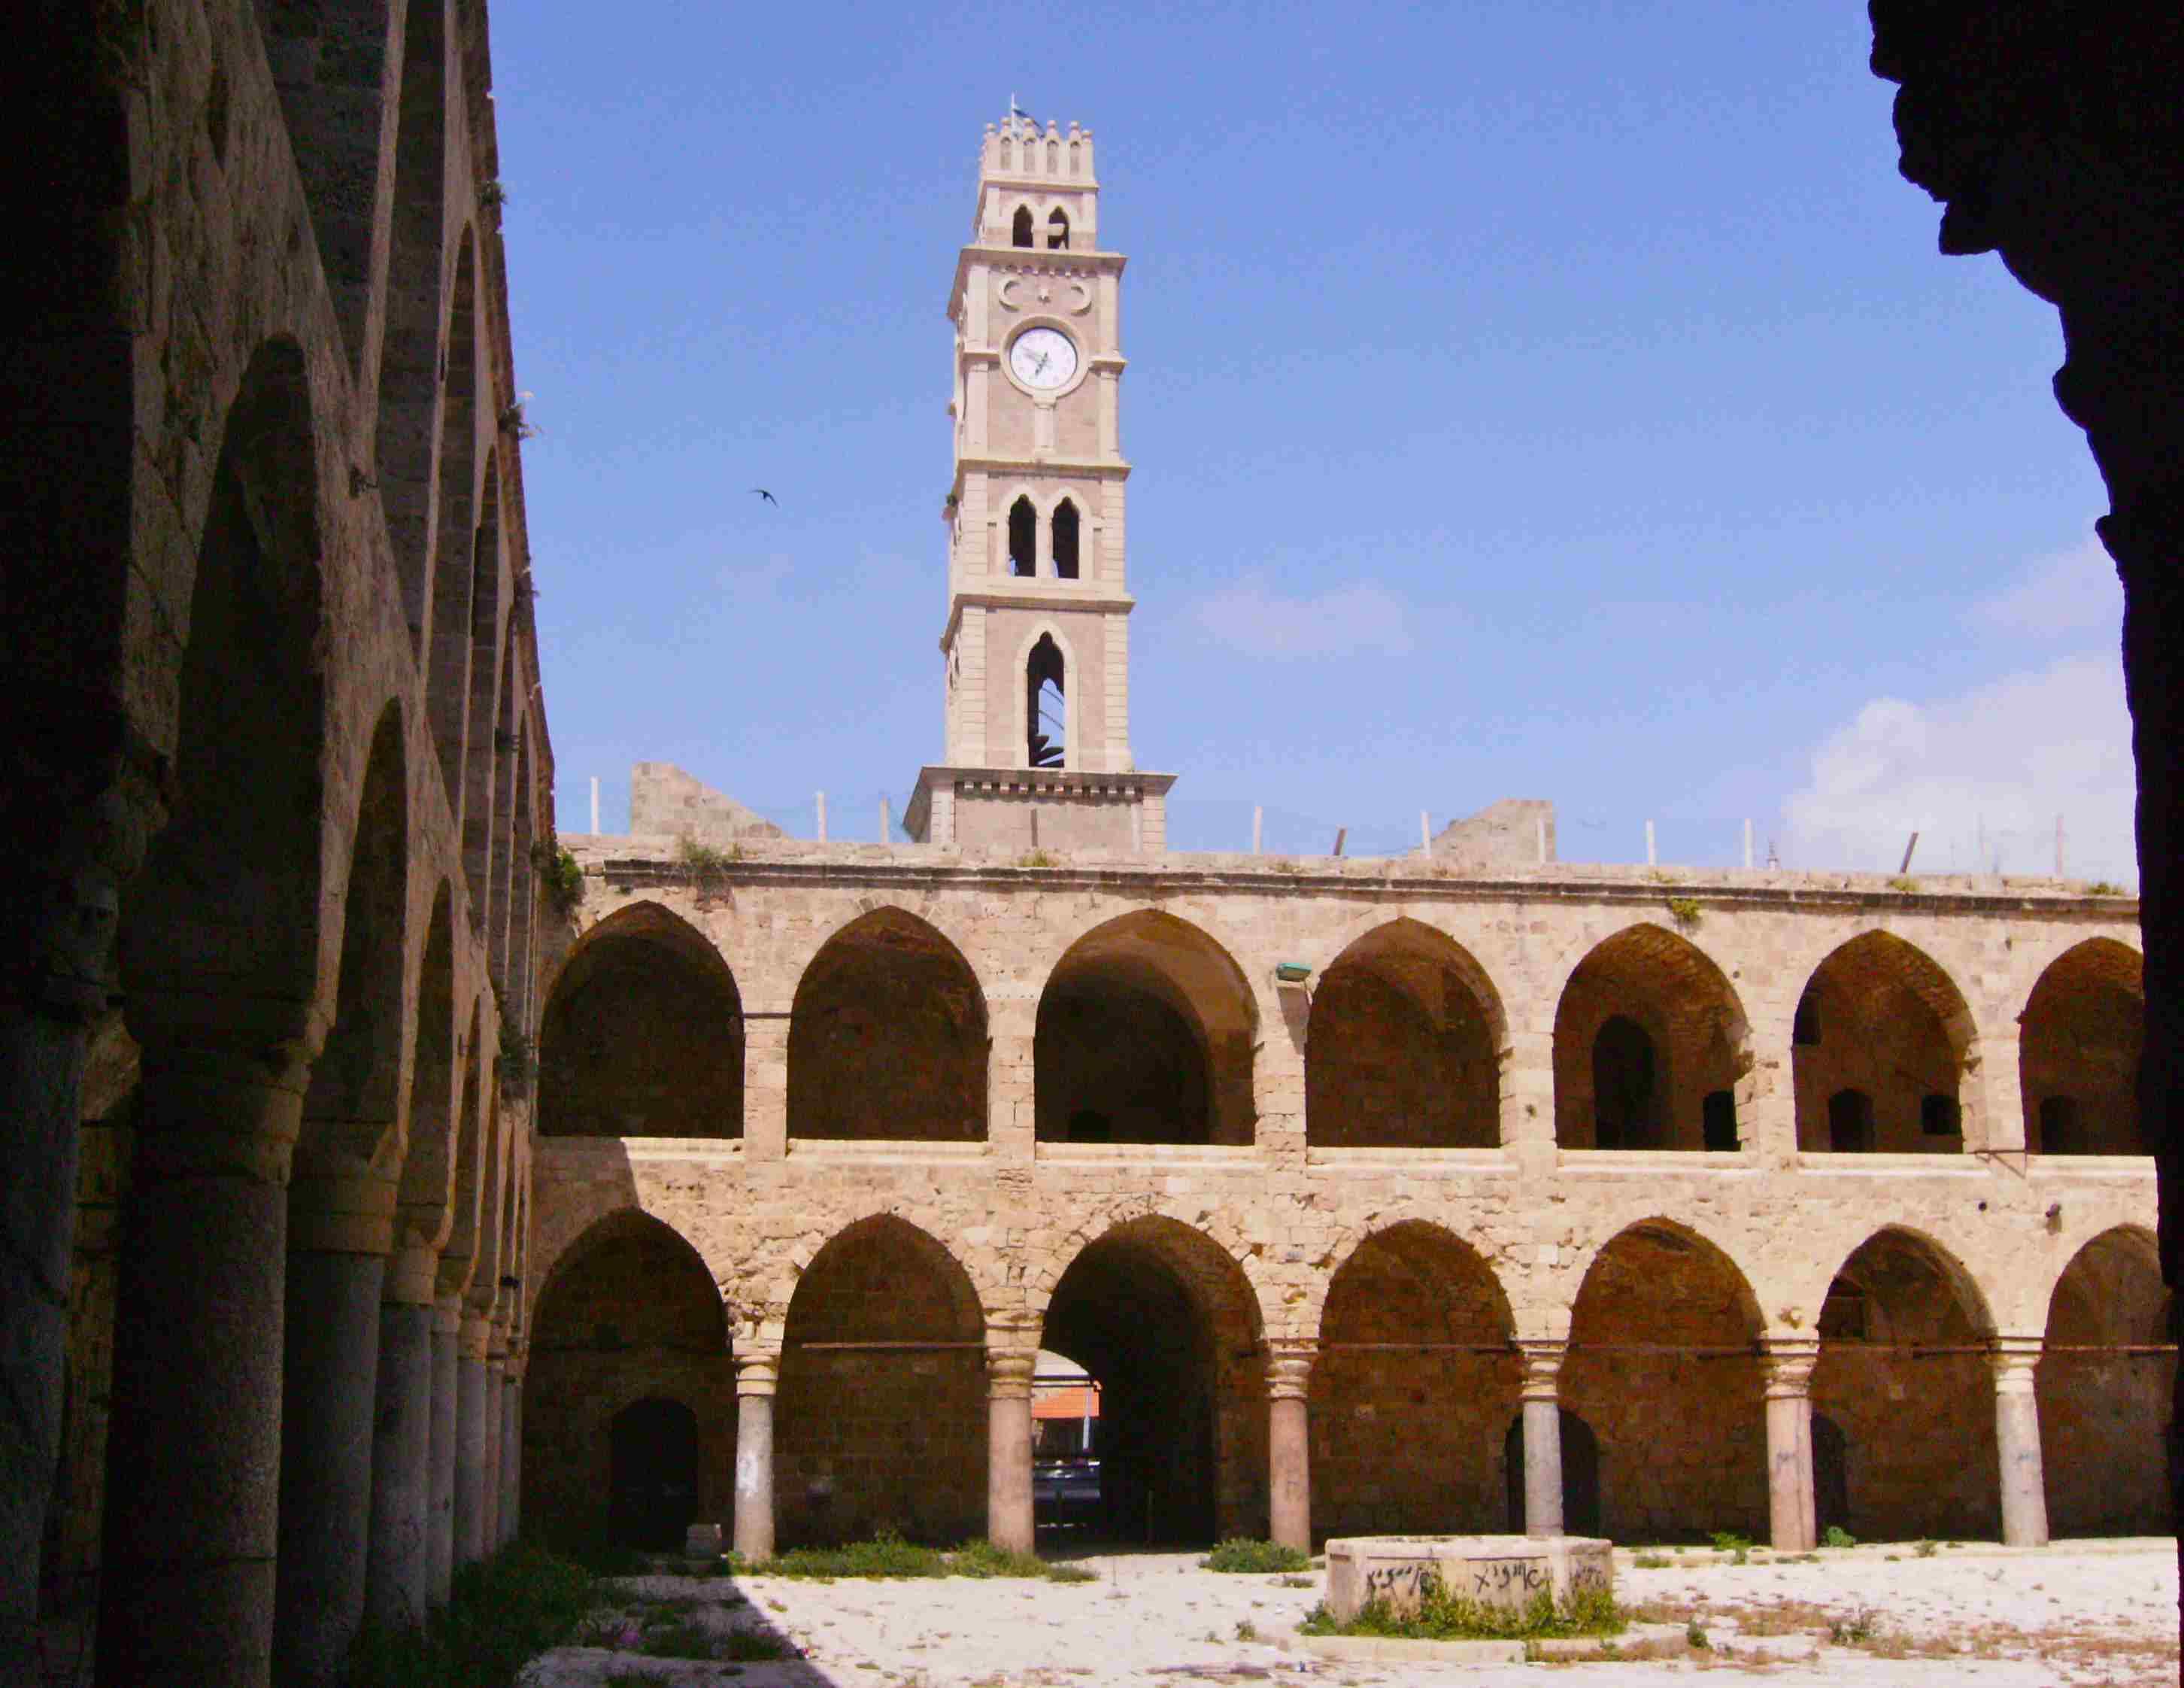 Akko's Khan al-Umdan, or Inn of the Pillars, was an early hotel for merchants who arrived by sea or by camel train.